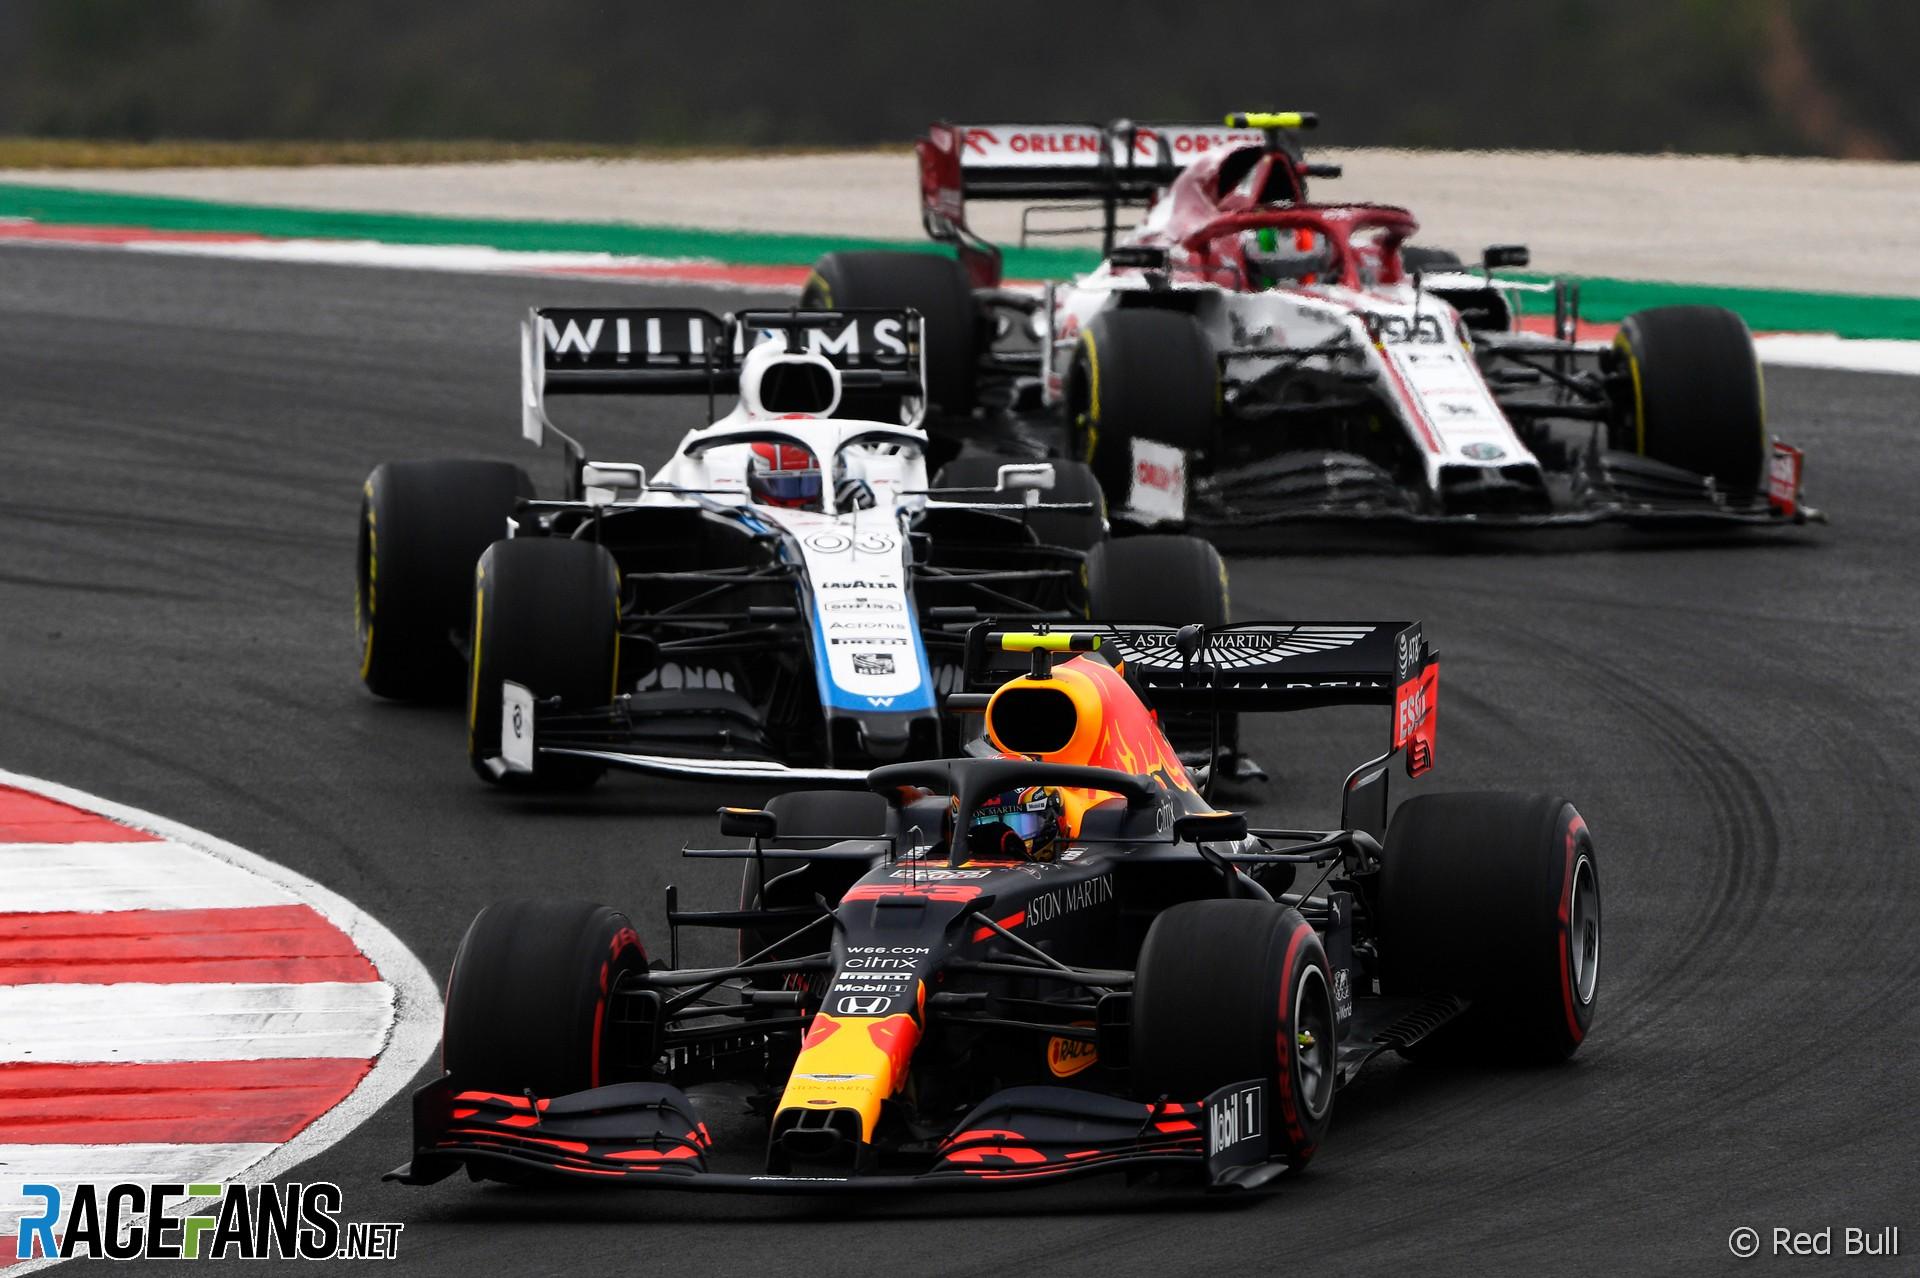 Alexander Albon, Red Bull, Autodromo do Algarve, 2020